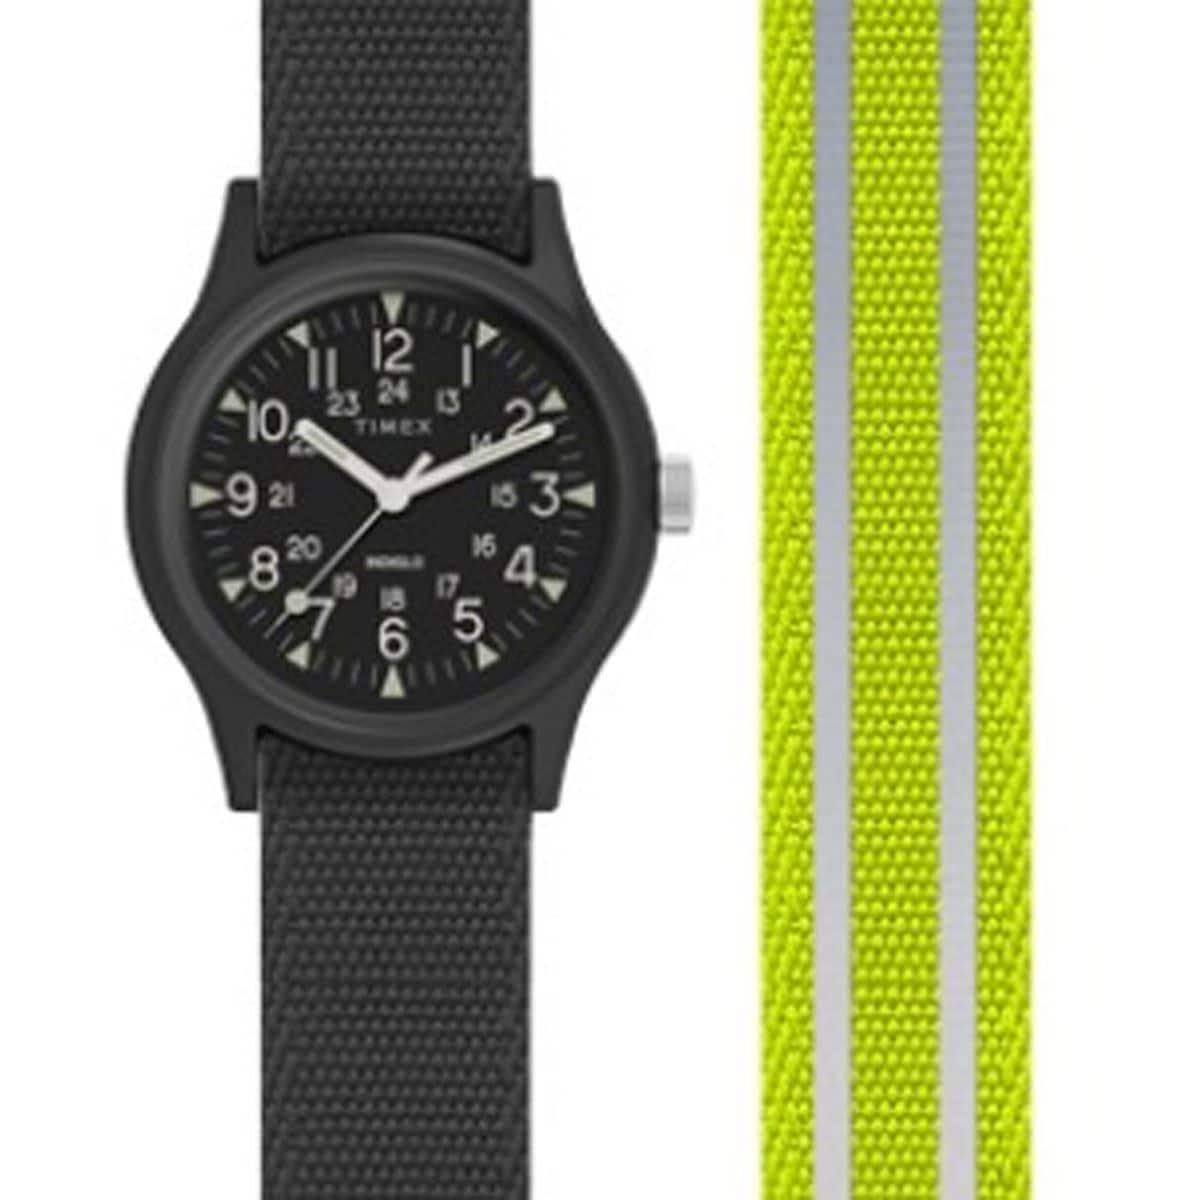 70c931485d41 Reloj timex tw2r81000 caballero fashion